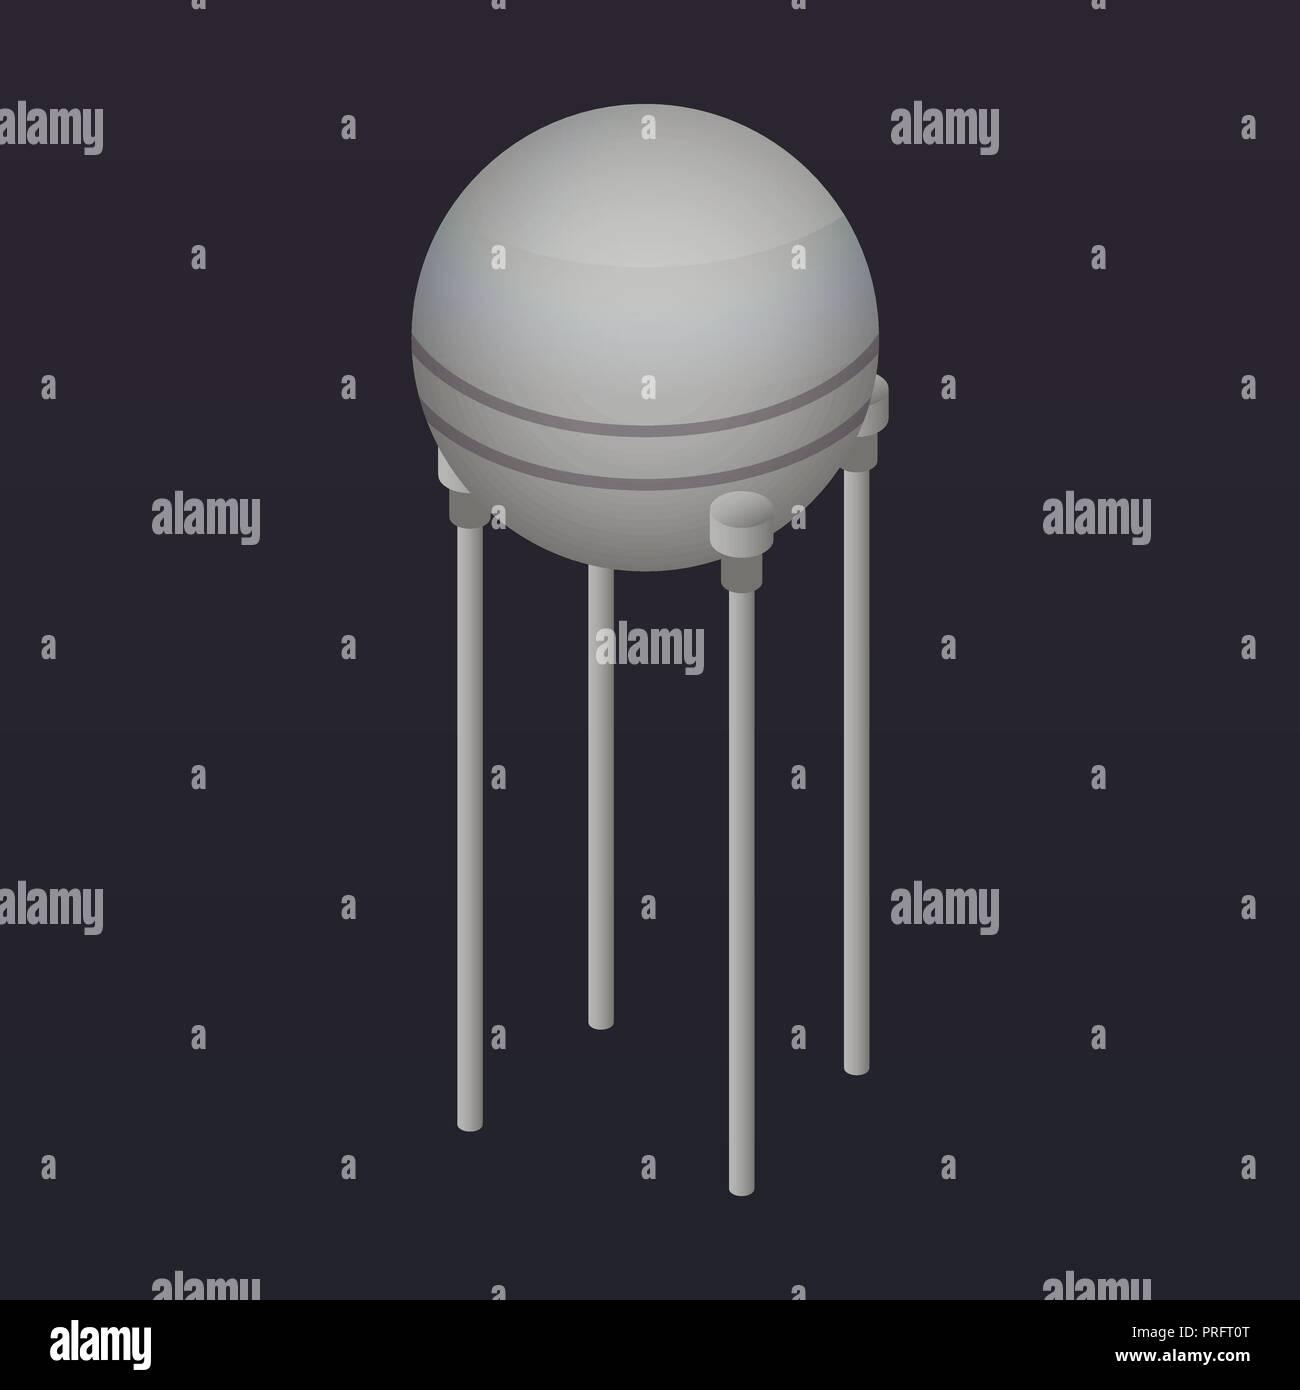 Orbital satellite icon, isometric style - Stock Image